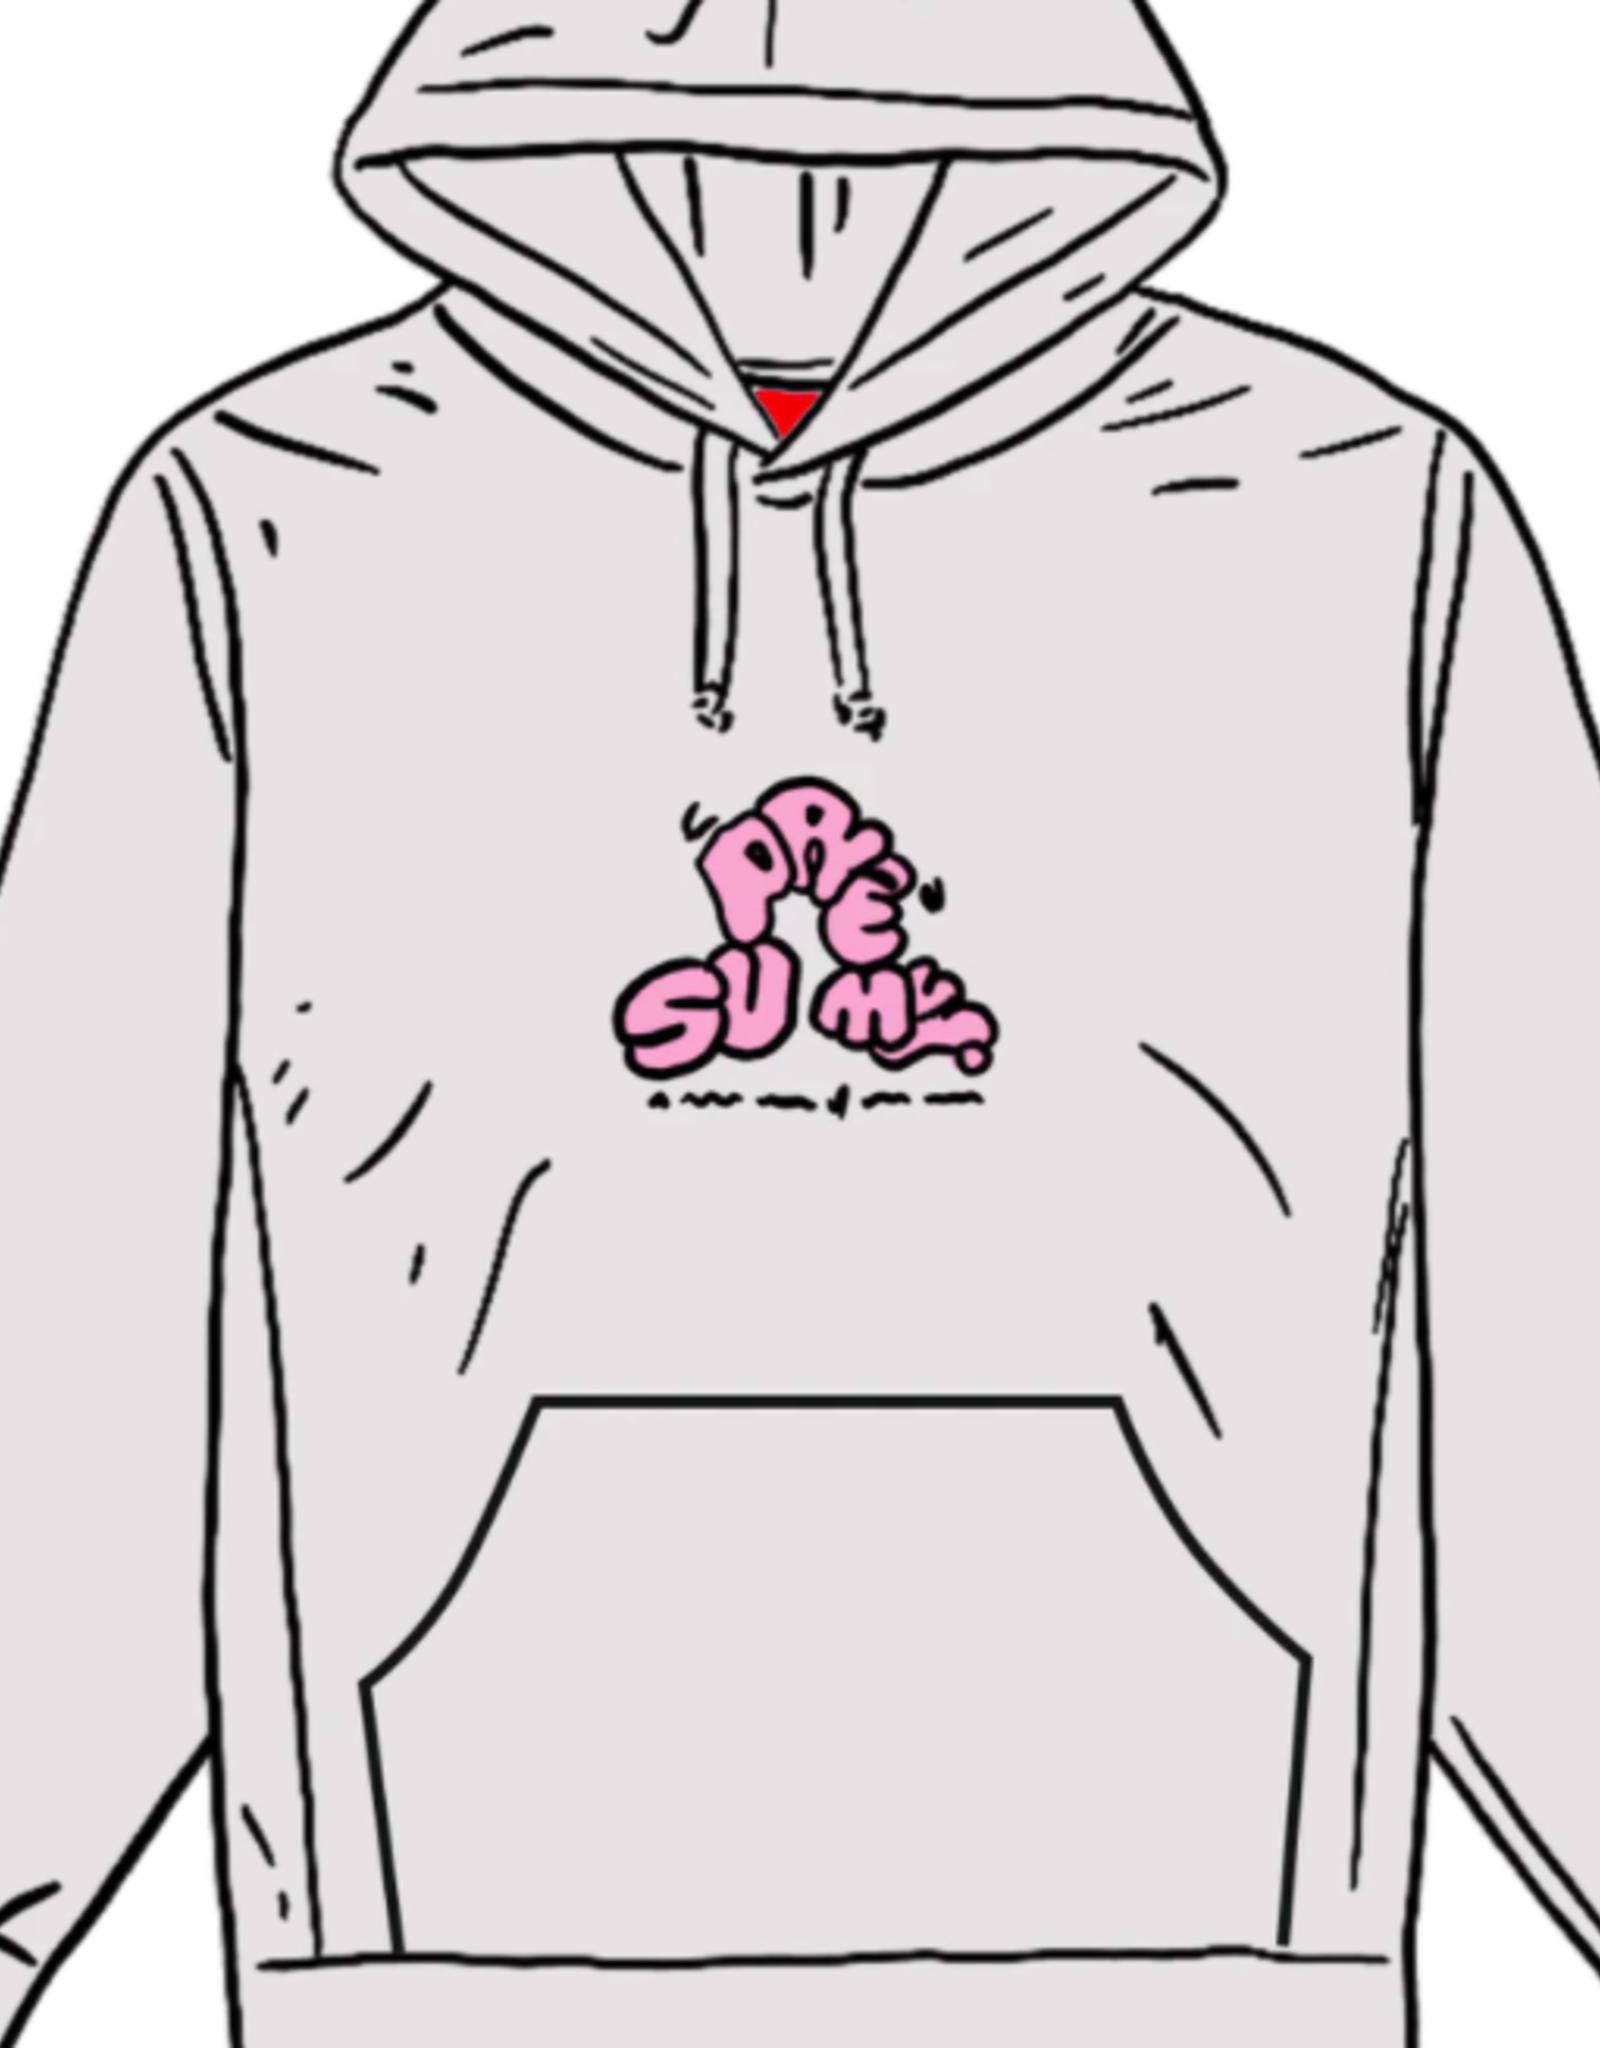 SUPREME Supreme Don't Care Hooded Sweatshirt Heather Multi XL